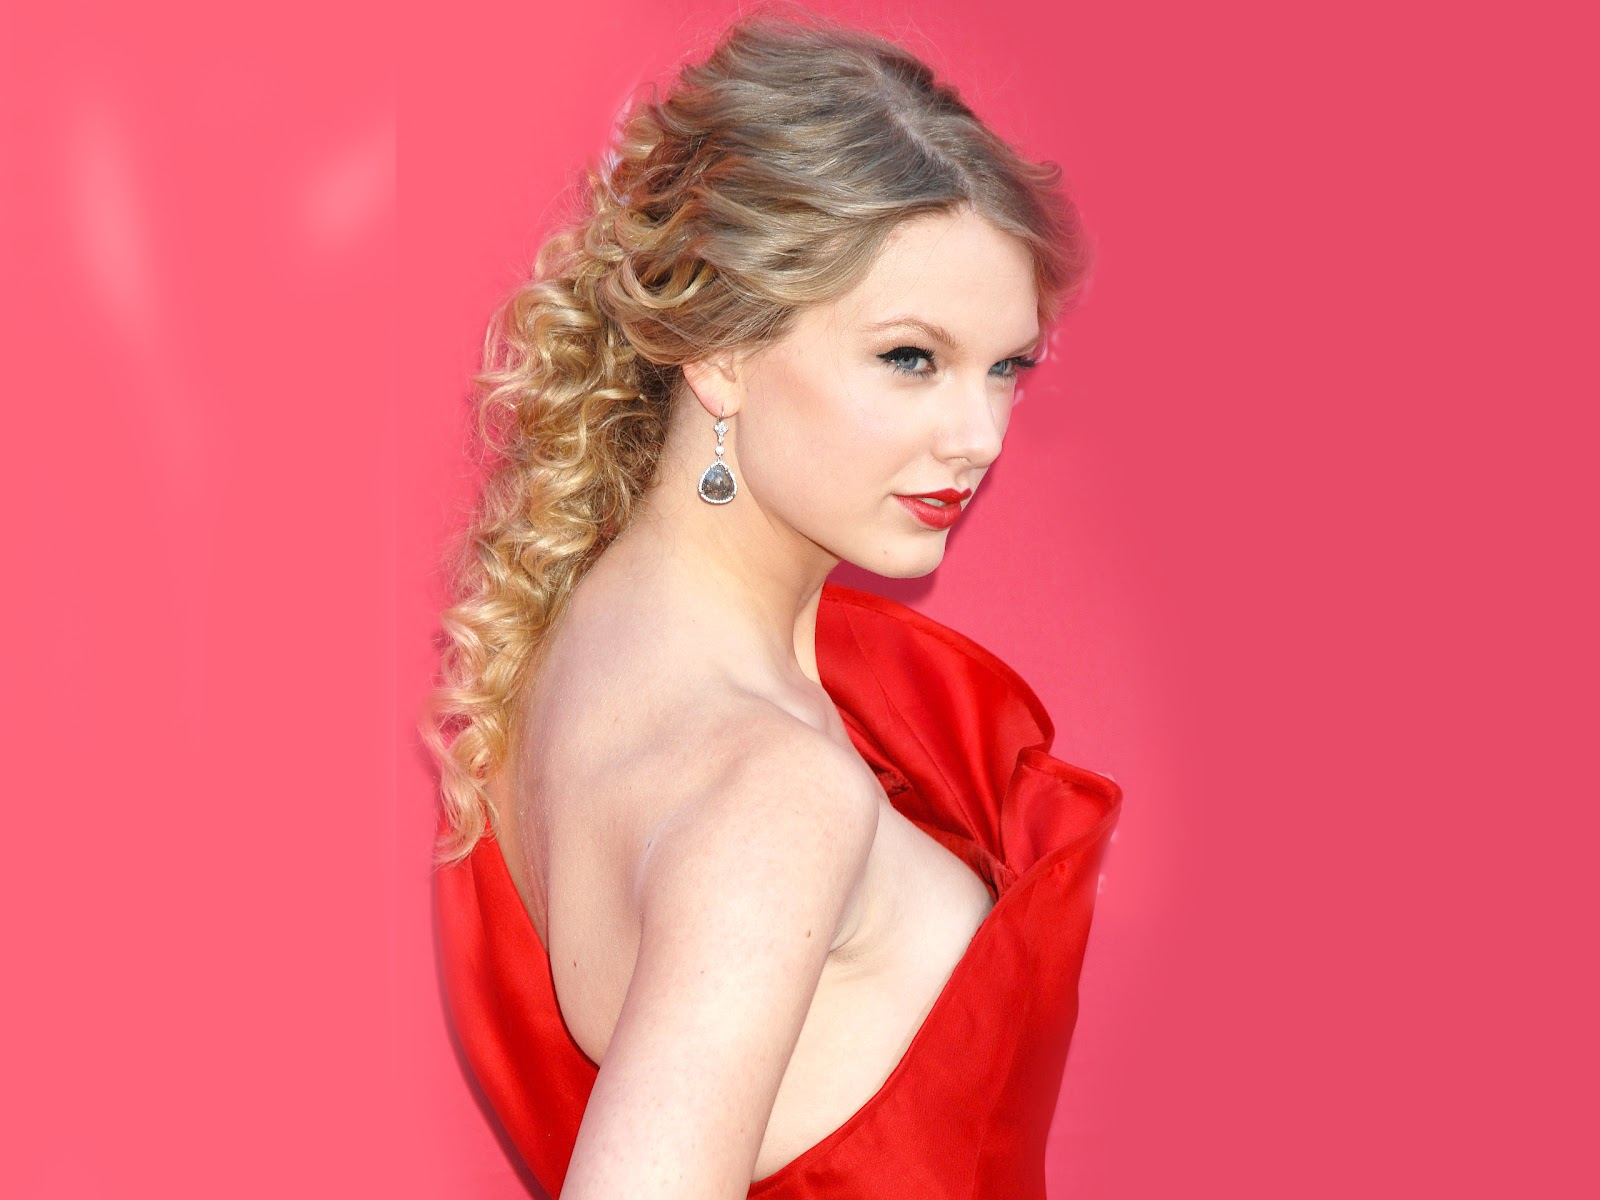 http://2.bp.blogspot.com/-OWlePeVH1kM/TzDlPlKOApI/AAAAAAAAGLA/NS13YRvBn3E/s1600/Taylor+Swift+Wallpaper-7.jpg